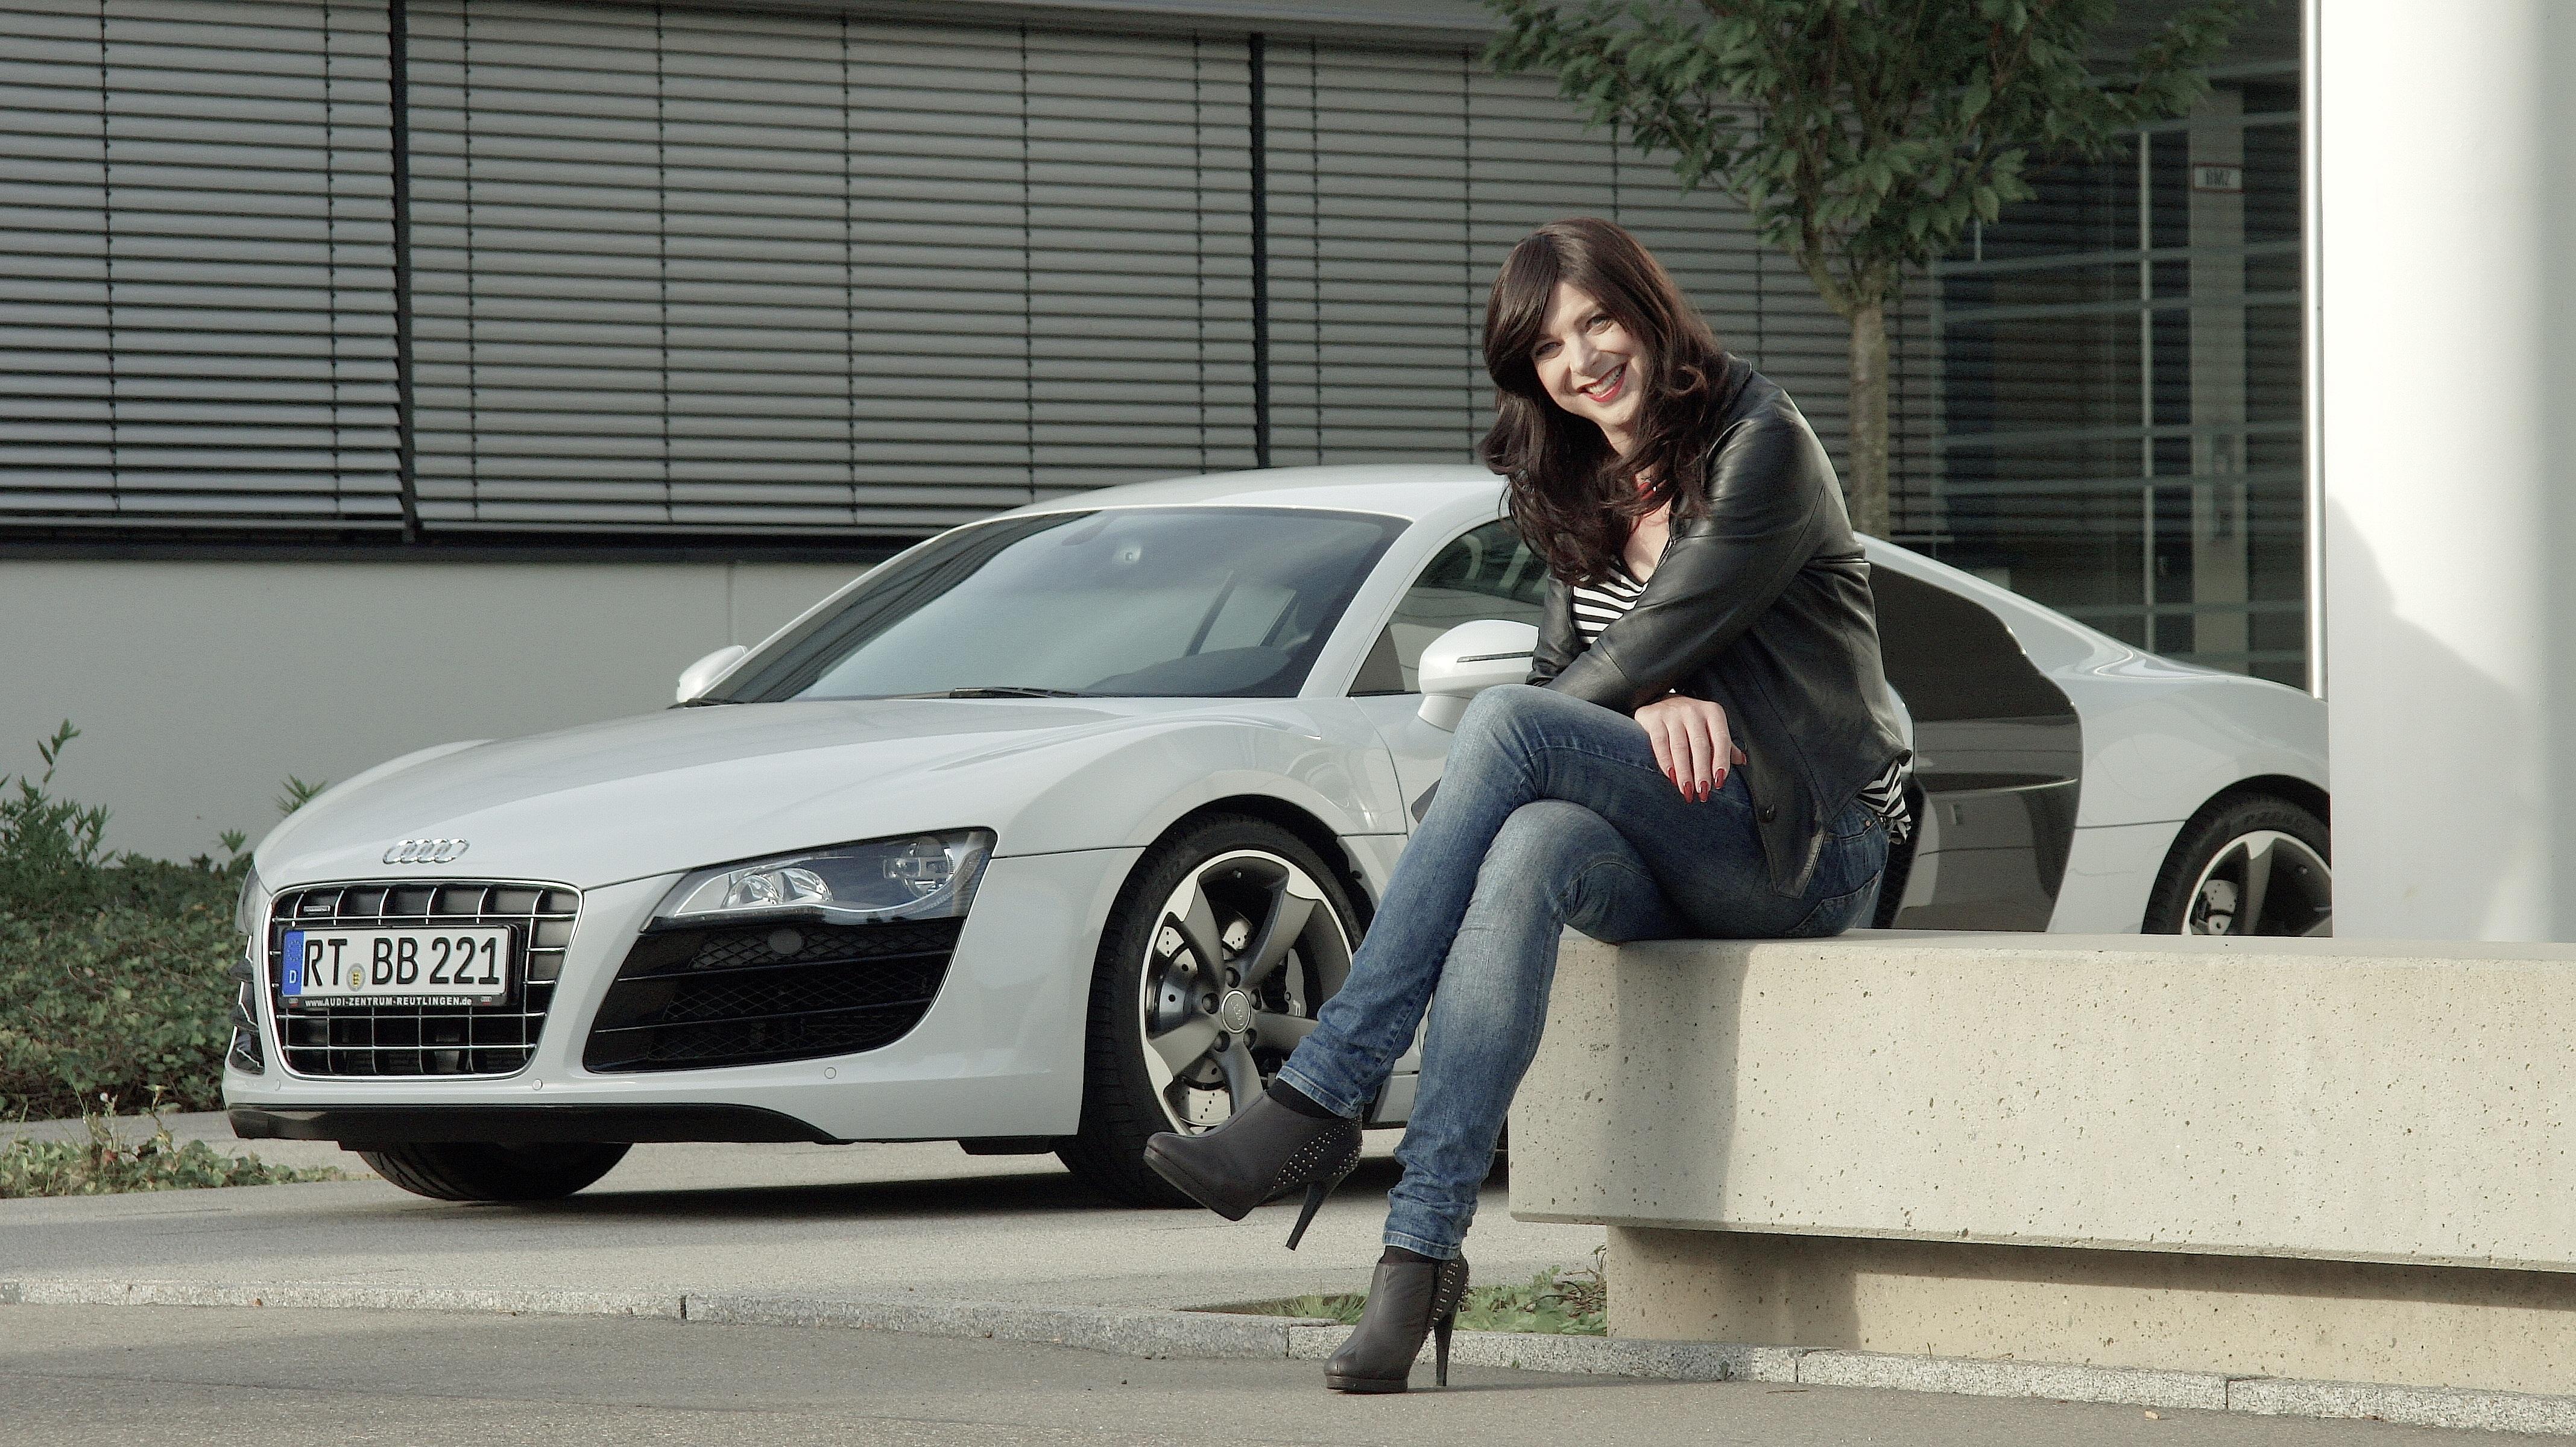 Free Images : Sun, Road, Wheel, Summer, Brunette, Auto, Sports Car, Makeup,  Supercar, Background, Beautiful, Coupe, Pkw, Joy Of Life, Super Sports Car,  ...